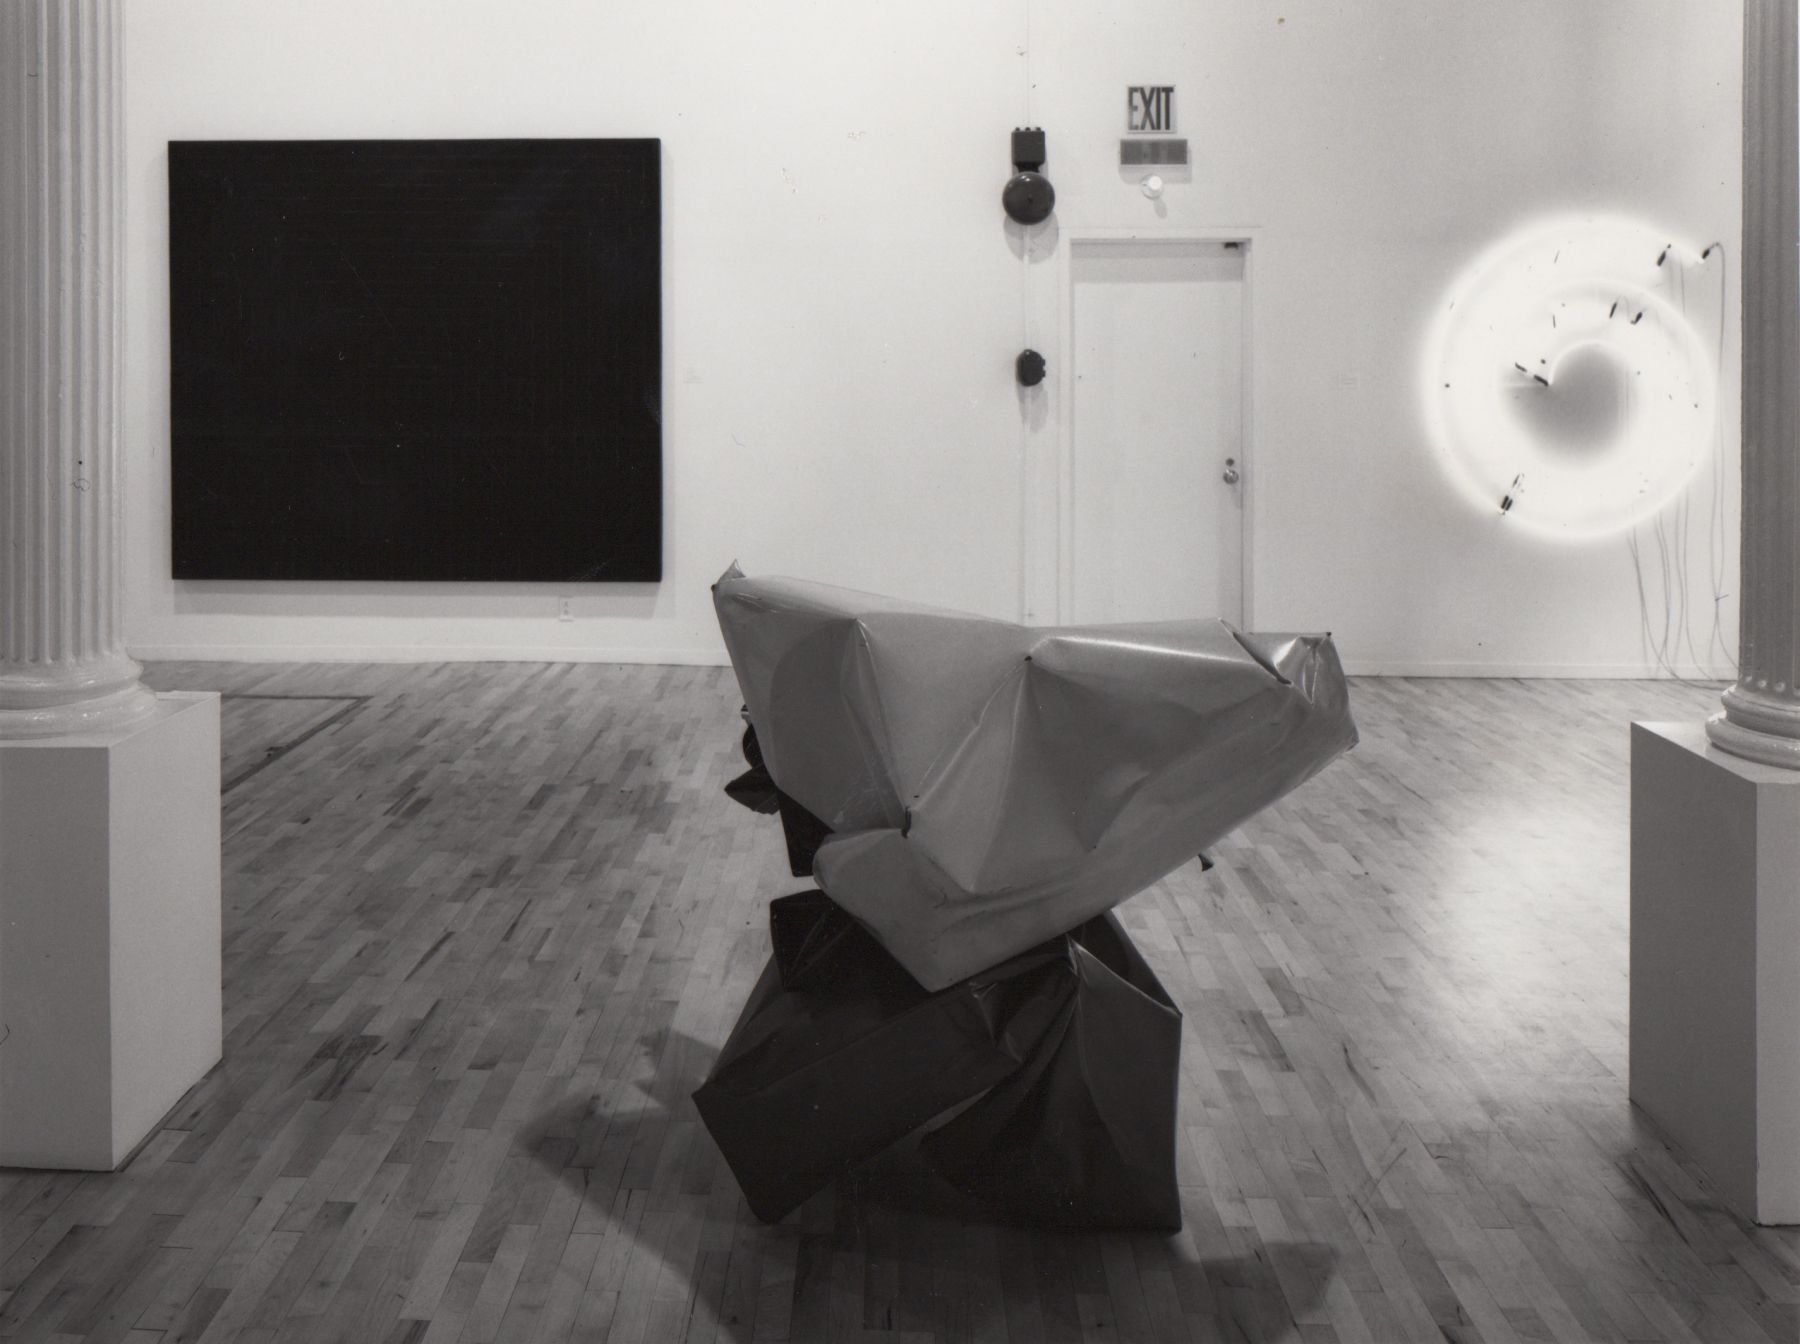 Installation view, 25th Anniversary Exhibition of Leo Castelli, 142 GREENE.